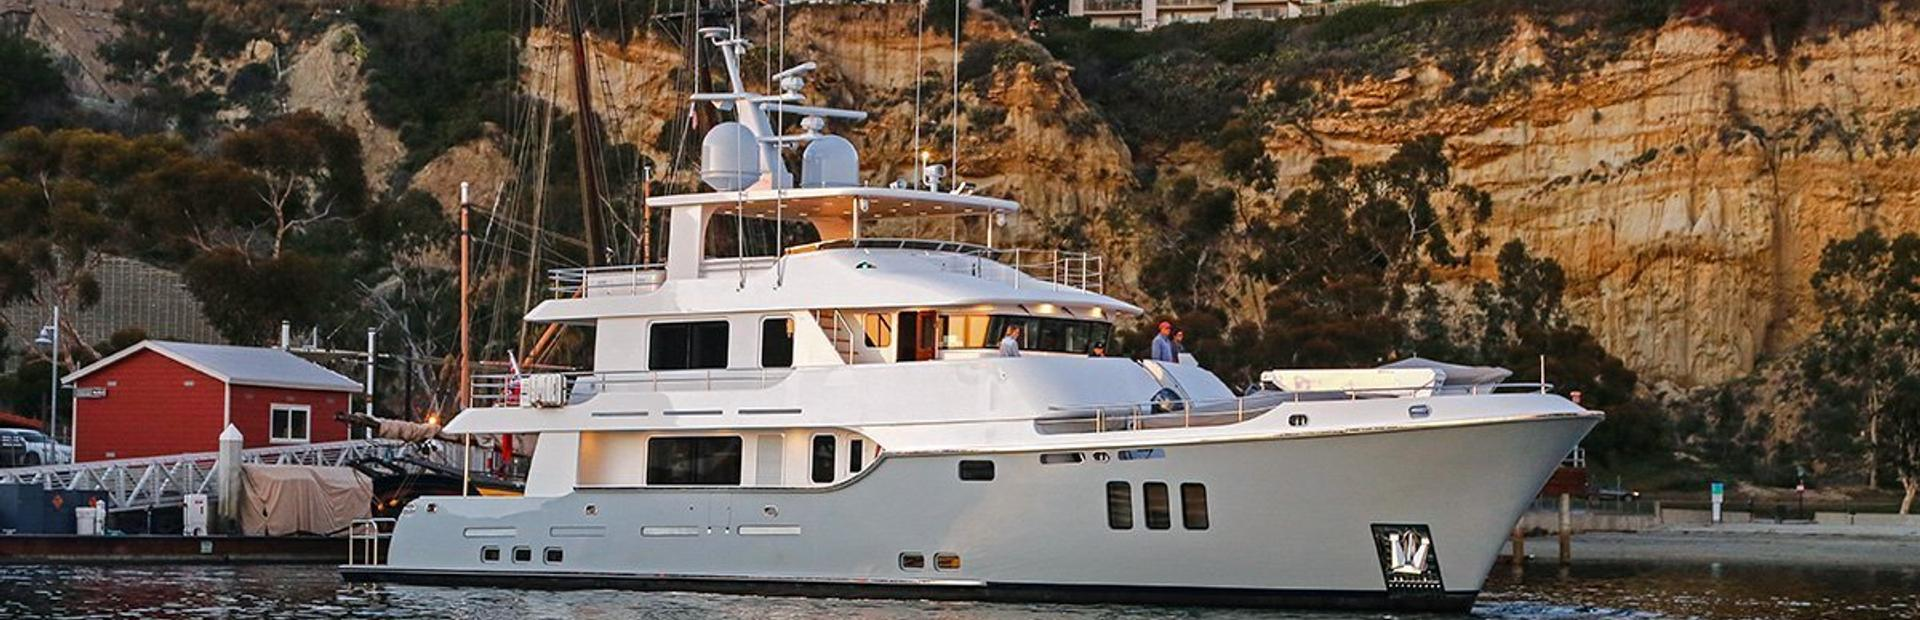 Nordhavn 96 Yacht Charter